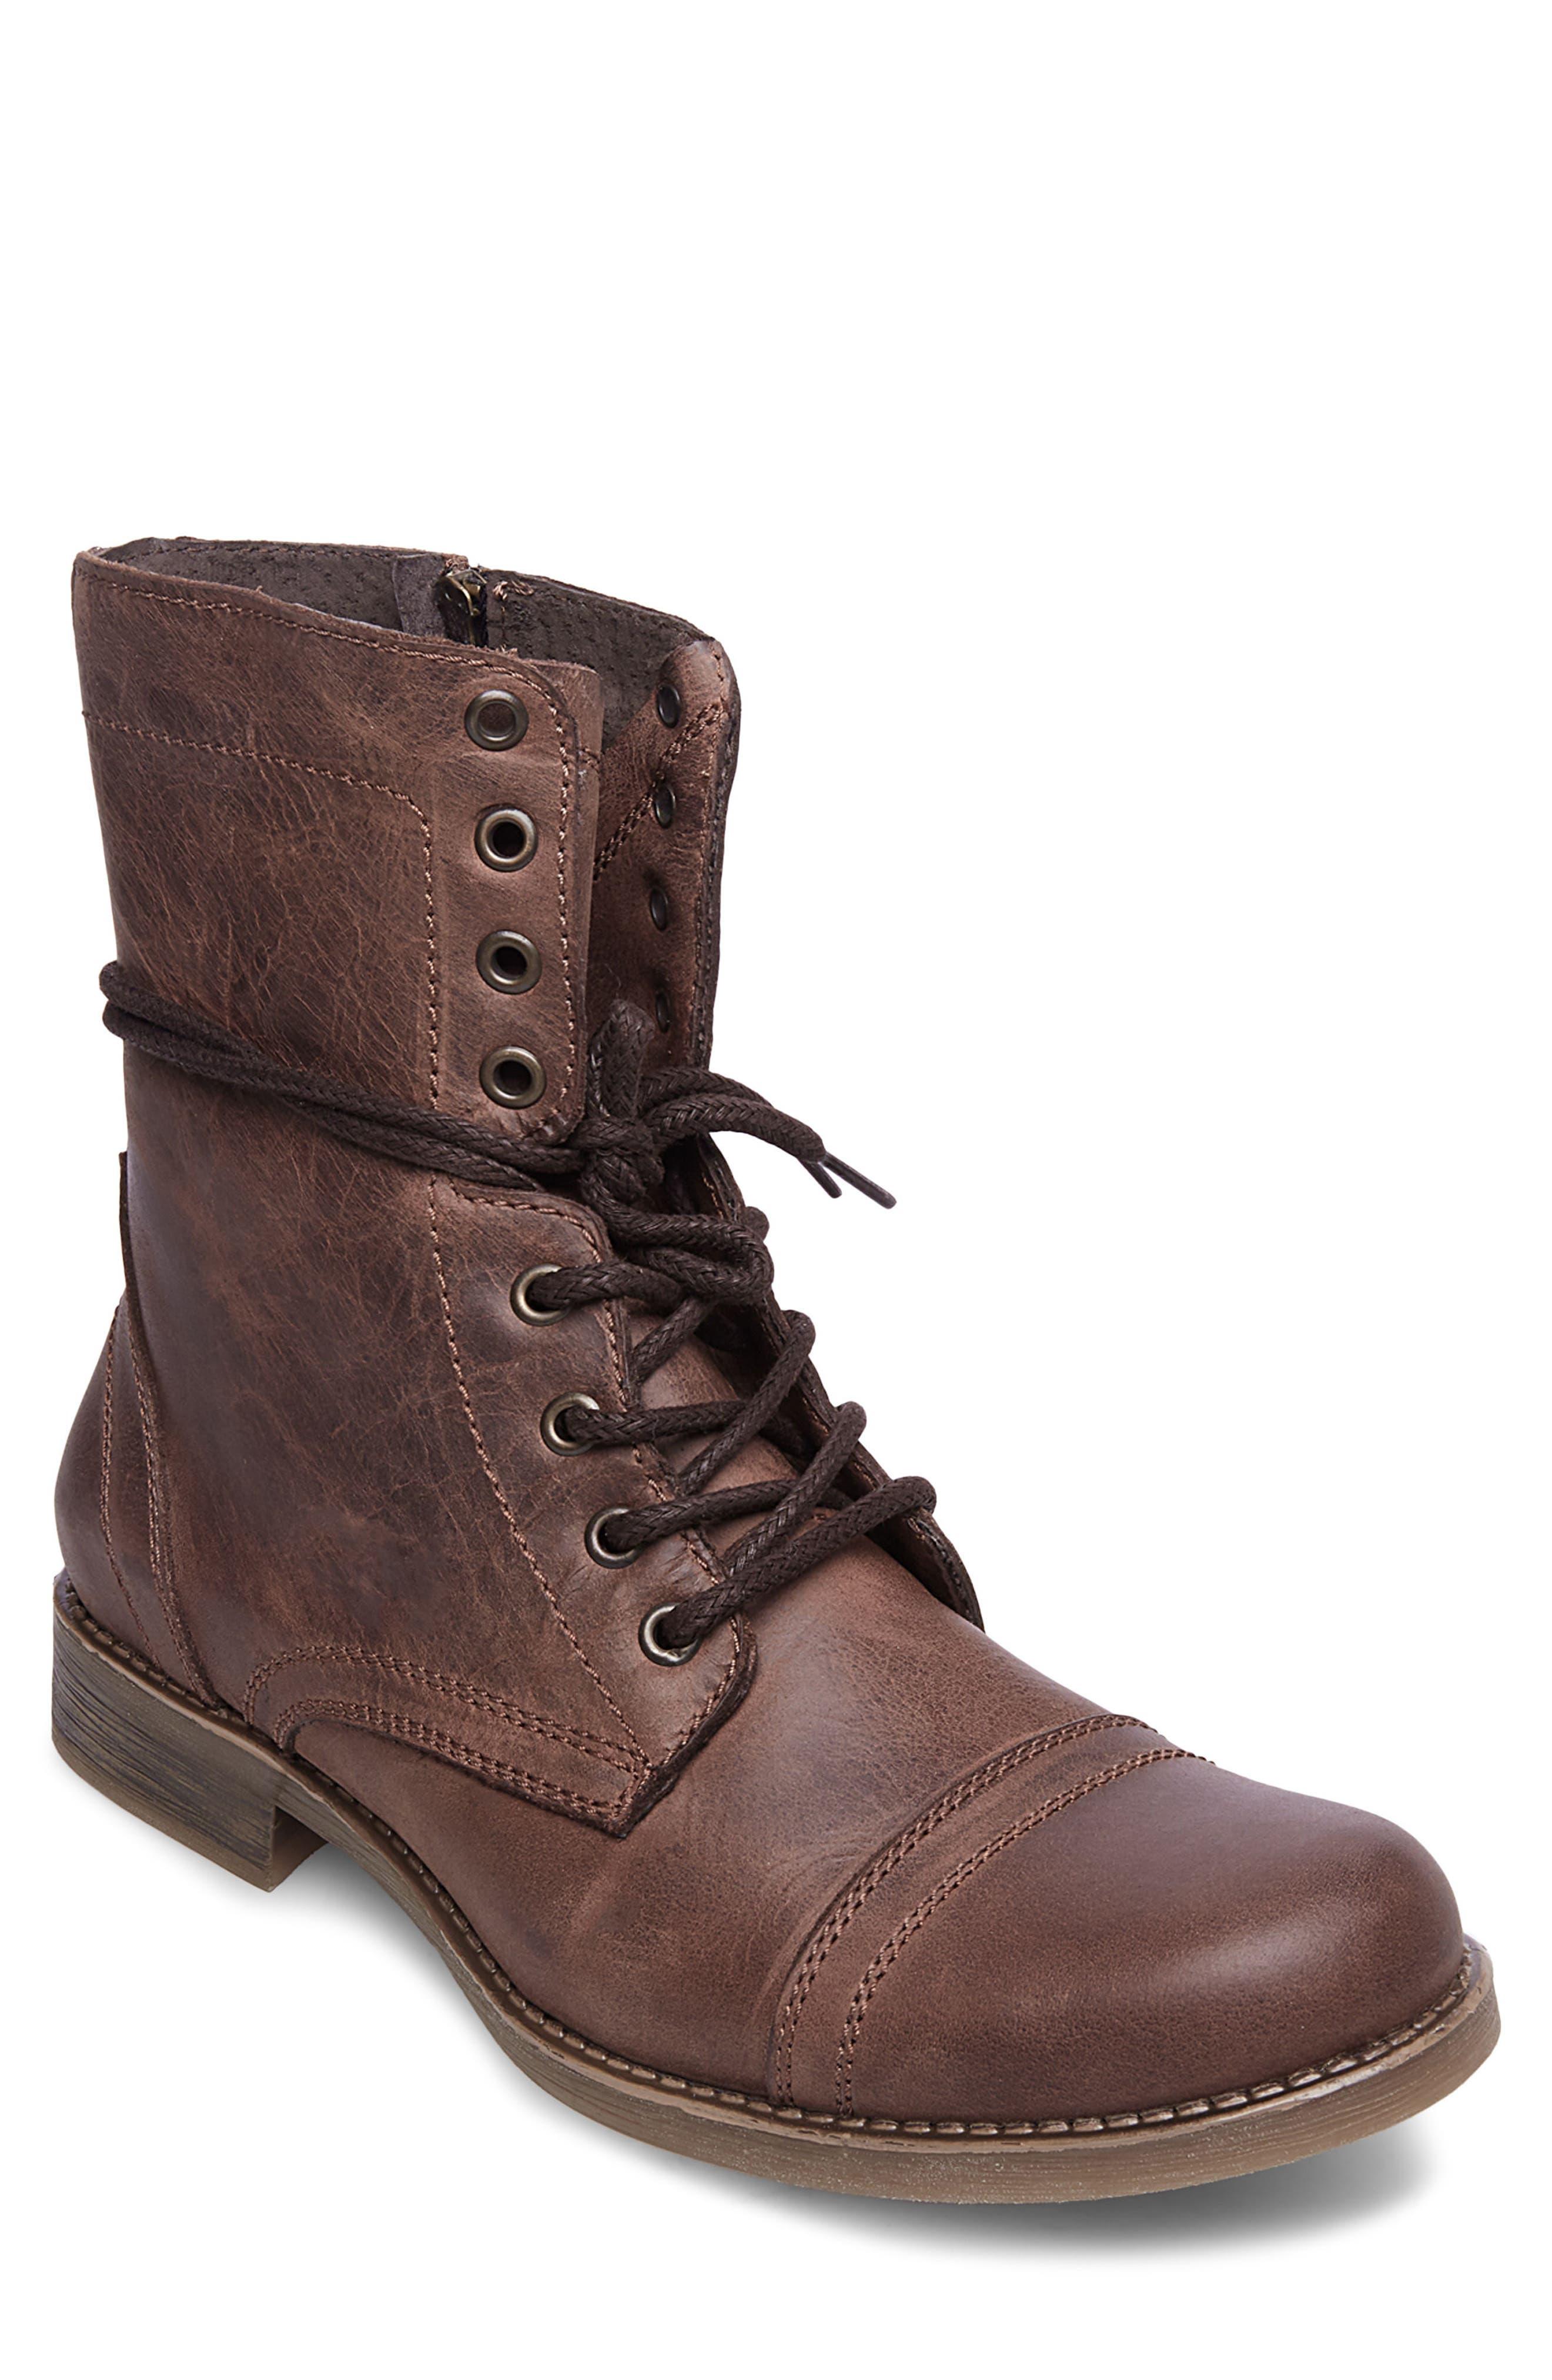 Steve Madden Troopah-C Cap Toe Boot, Brown